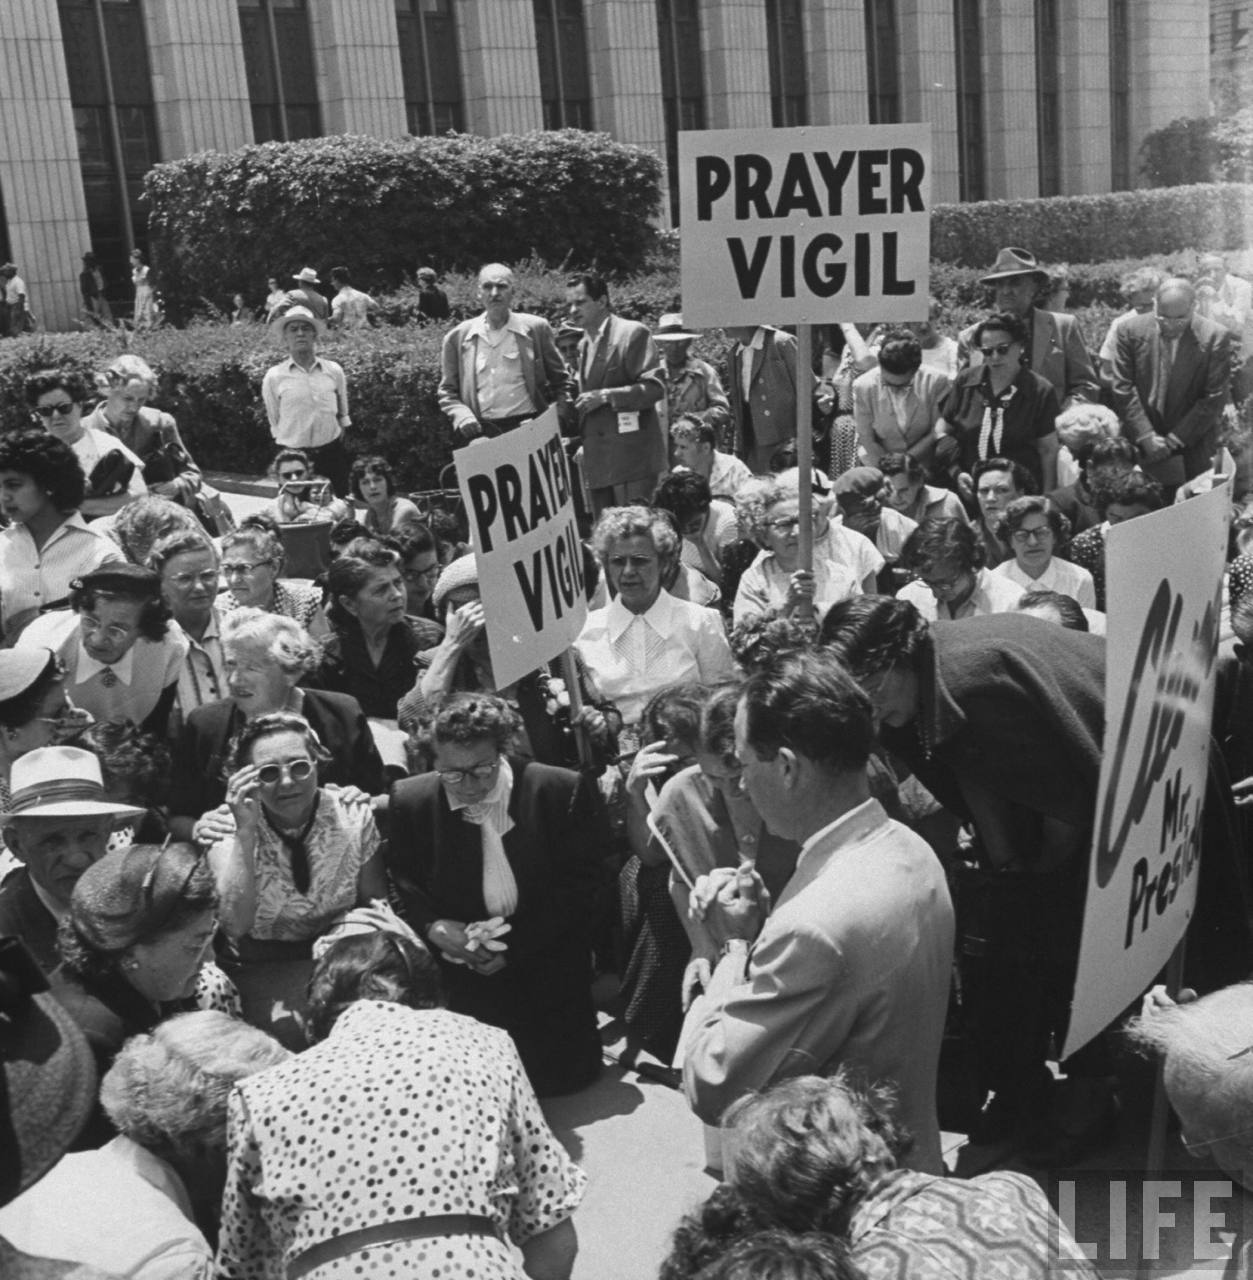 Vigilia por el matrimonio Rosenberg, en Los Ángeles (California).